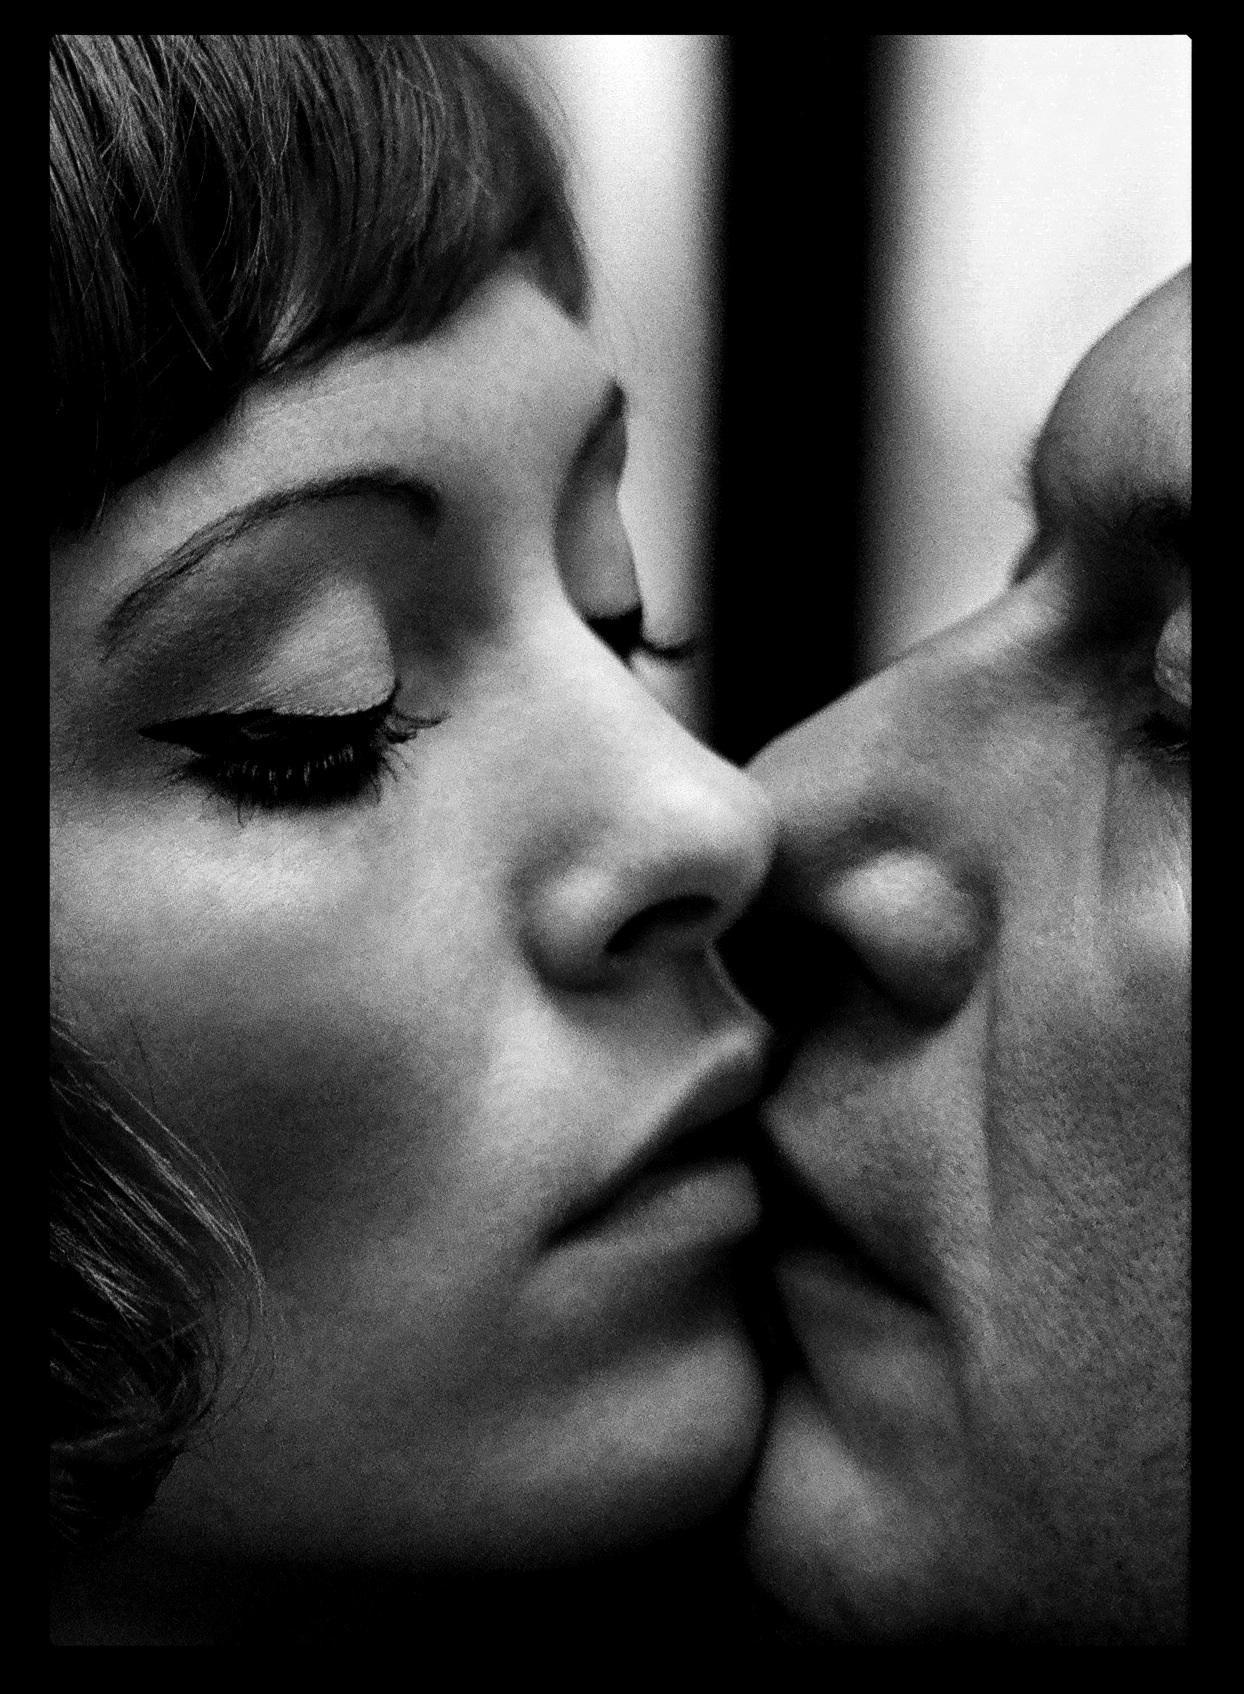 KISSING_thumb-2.jpg (JPEG-Grafik, 1244×1694 Pixel)